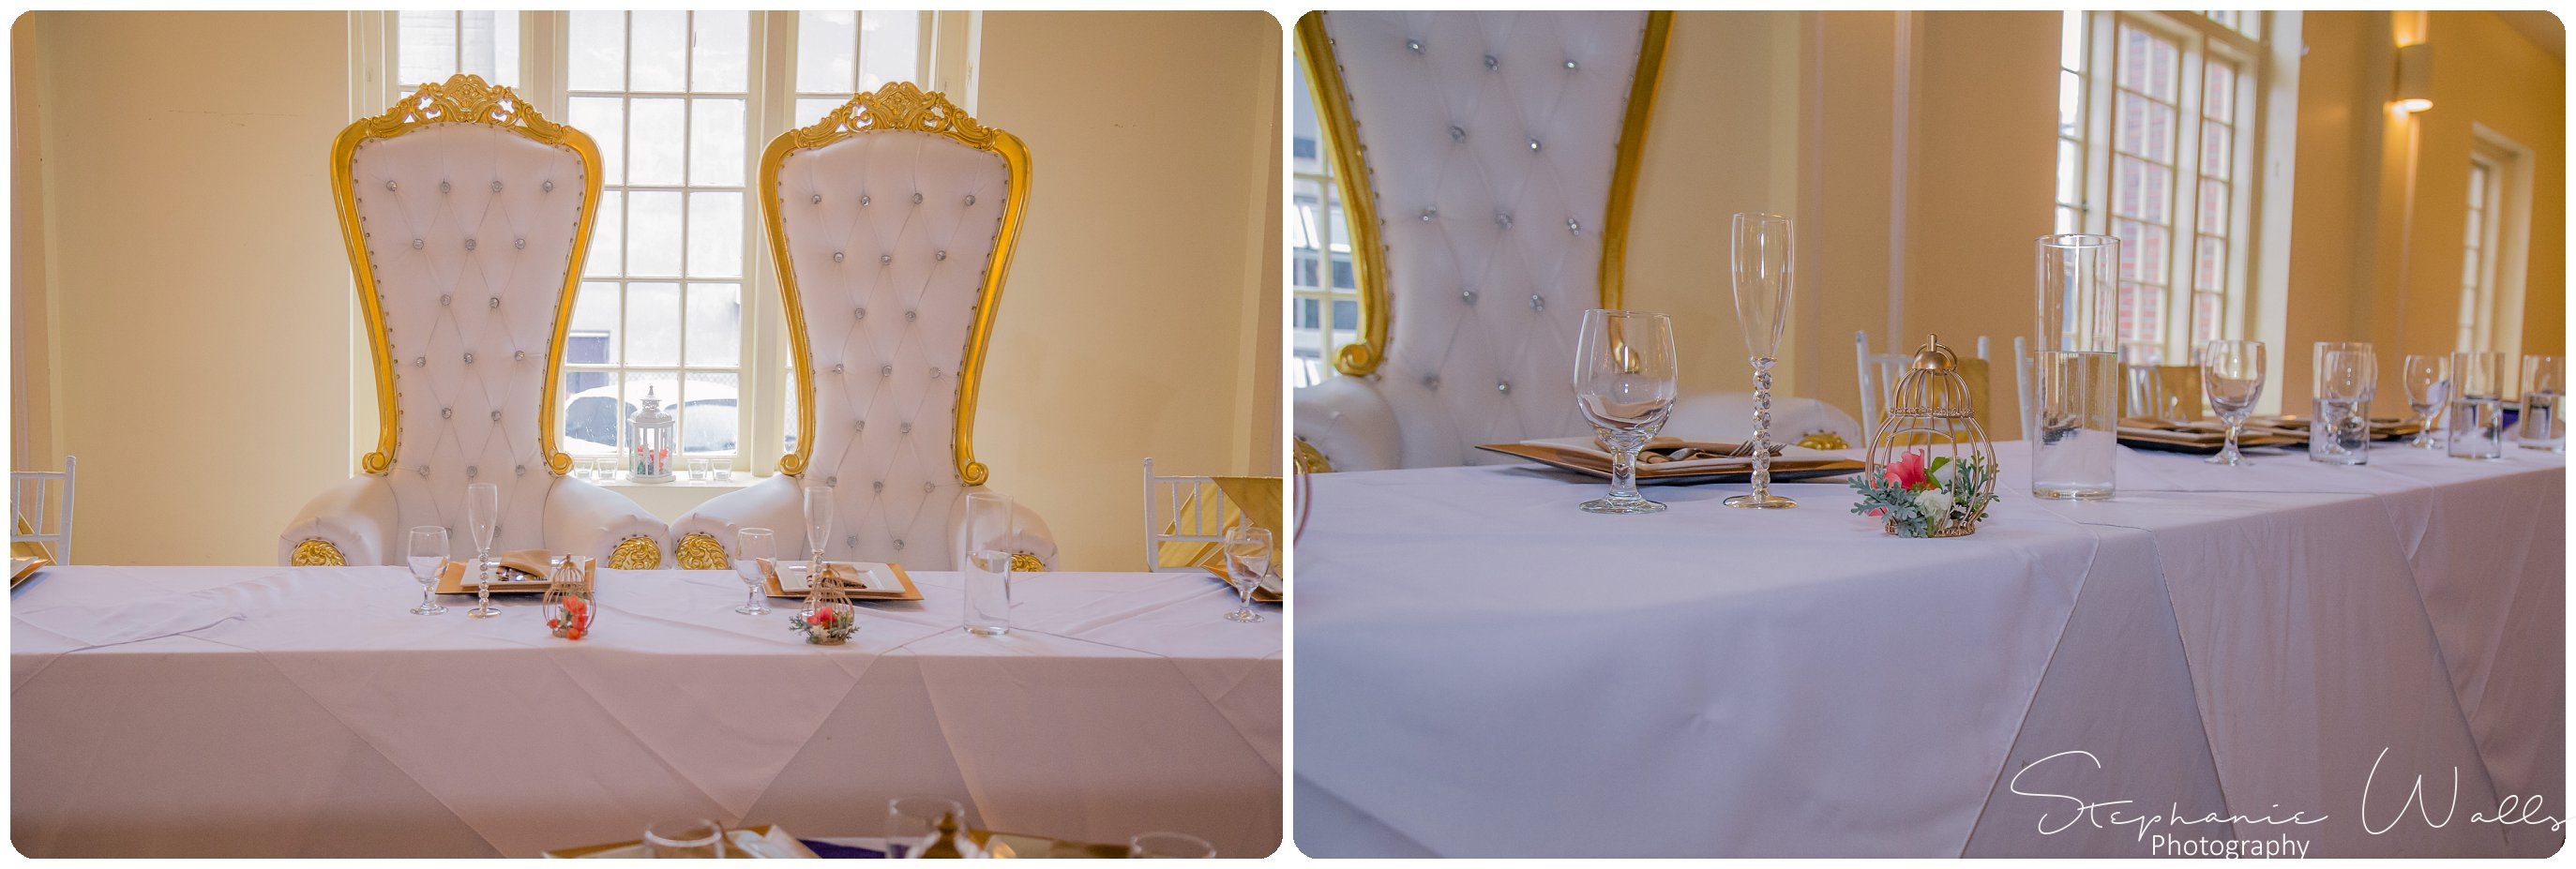 Sears Details 122 The Hero & The Starlet | Monte Cristo Ballroom | Stephanie Walls Photography Weddings